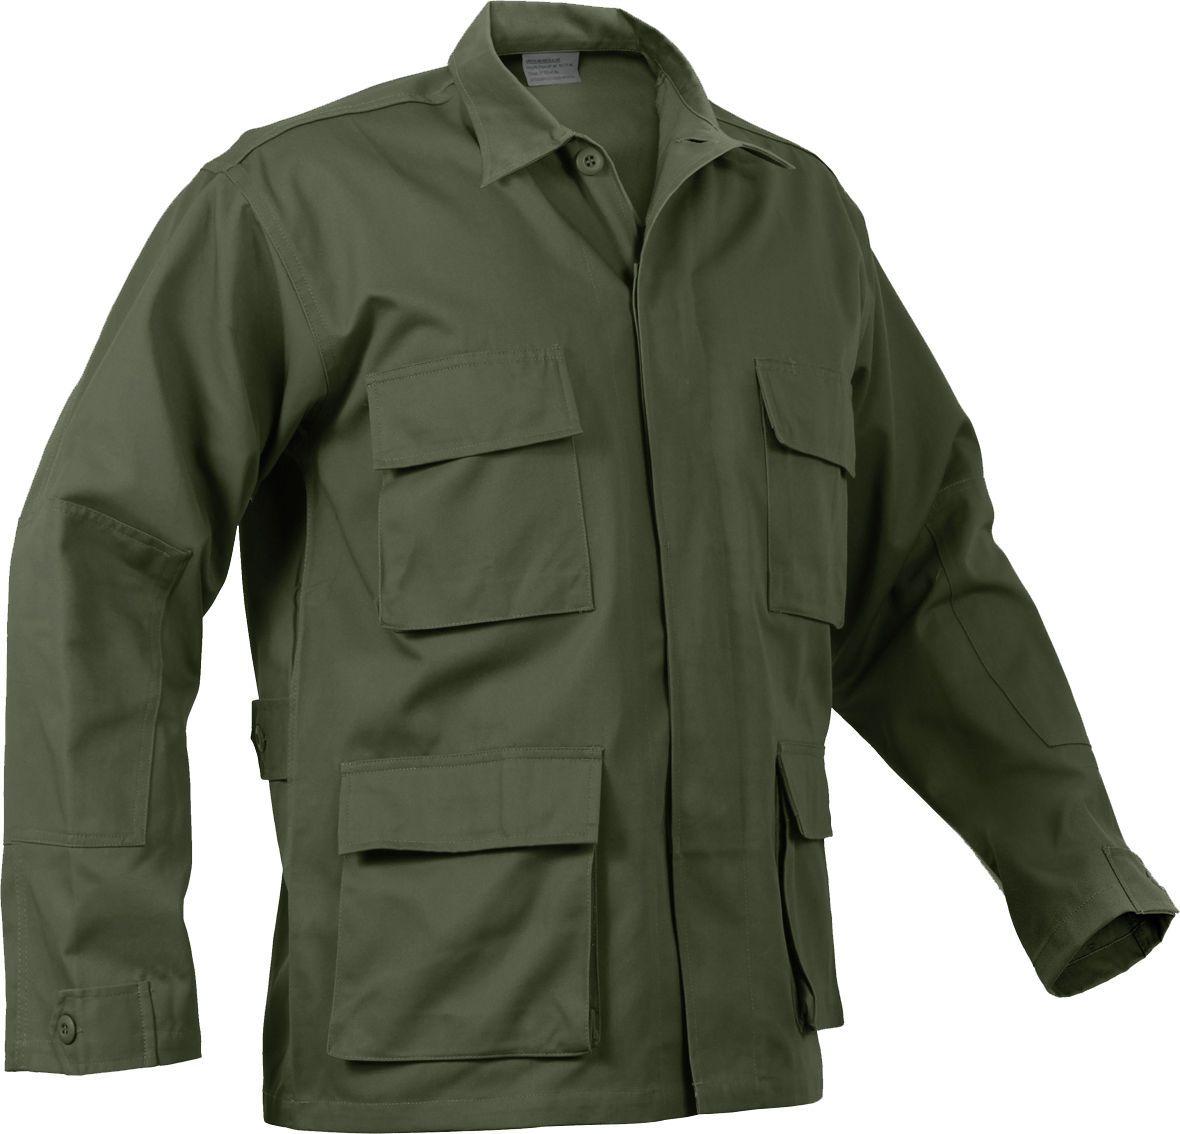 Mens Olive Drab Long Sleeve Military Bdu Shirt Coat Uniform Army Fatigues  Army Navy Store 0667d9d4b01